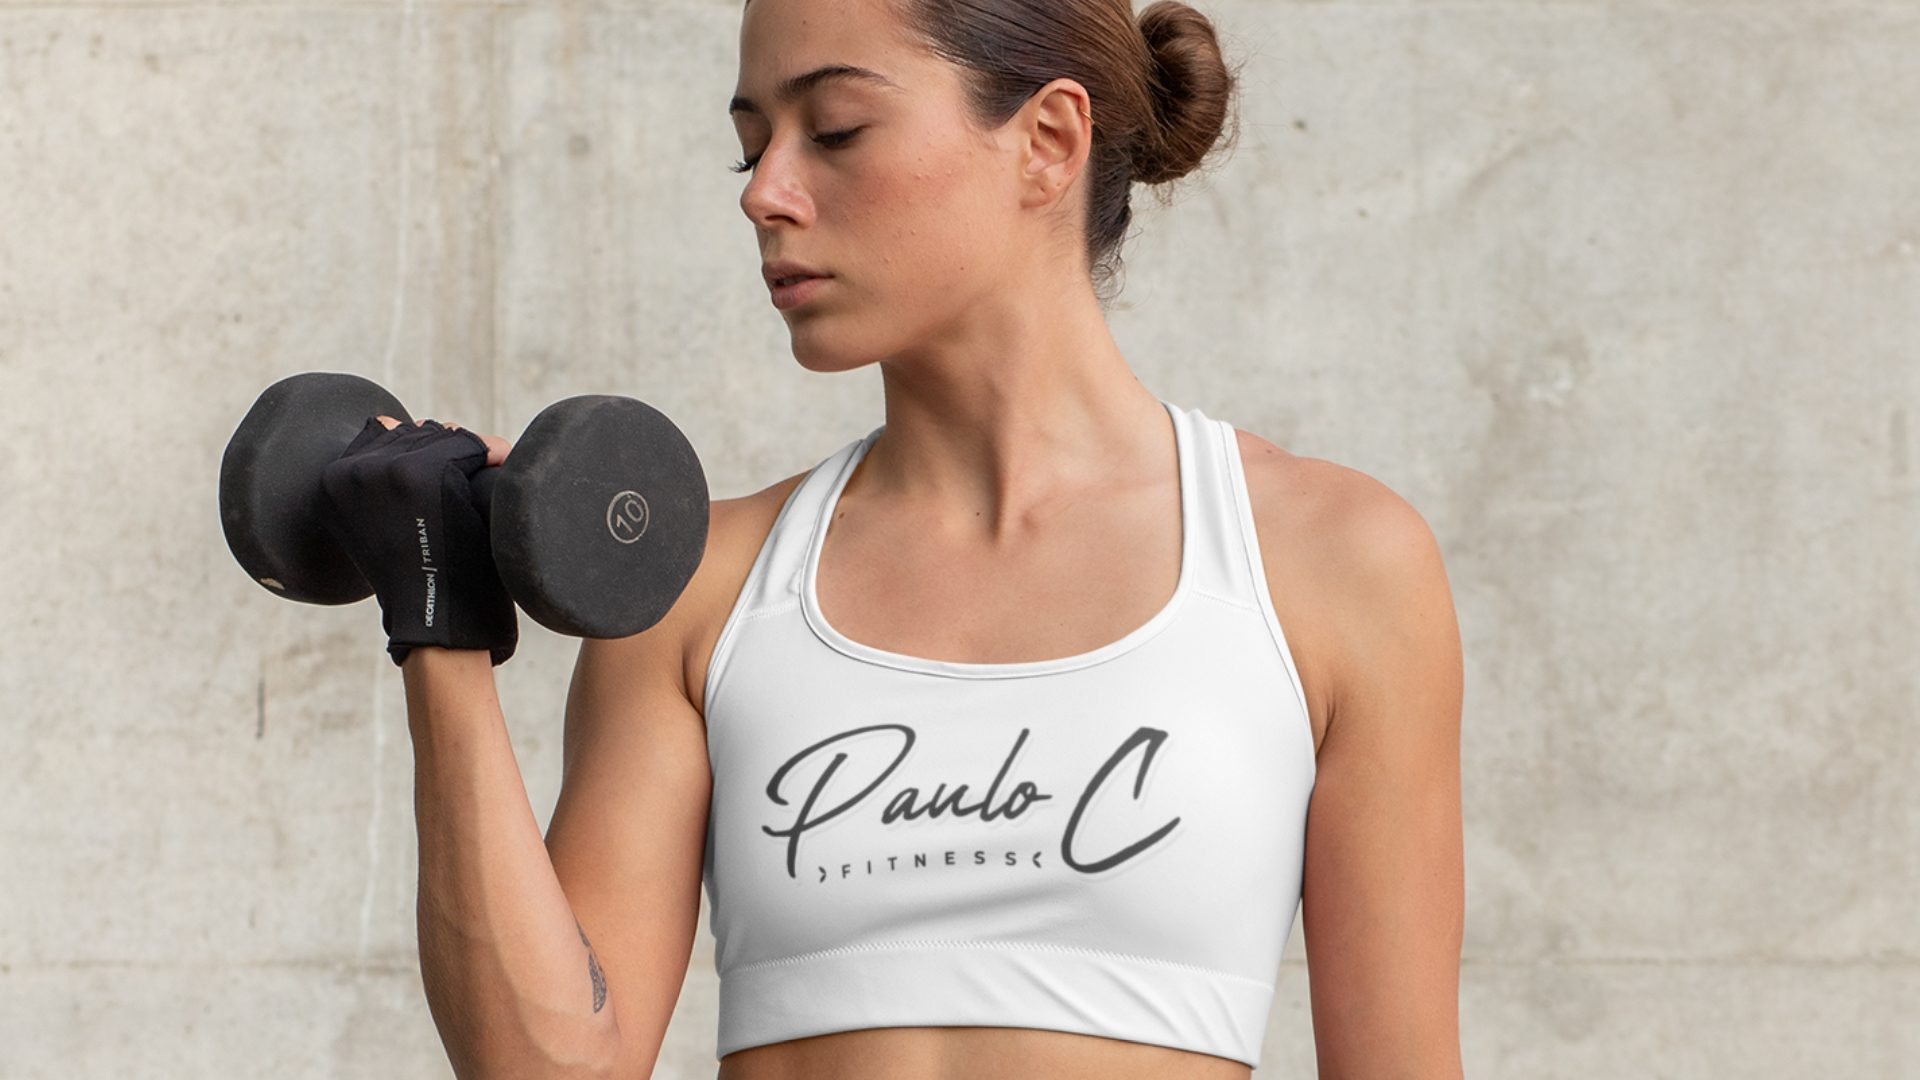 Paulo C Fitness - Logo Mockup 06